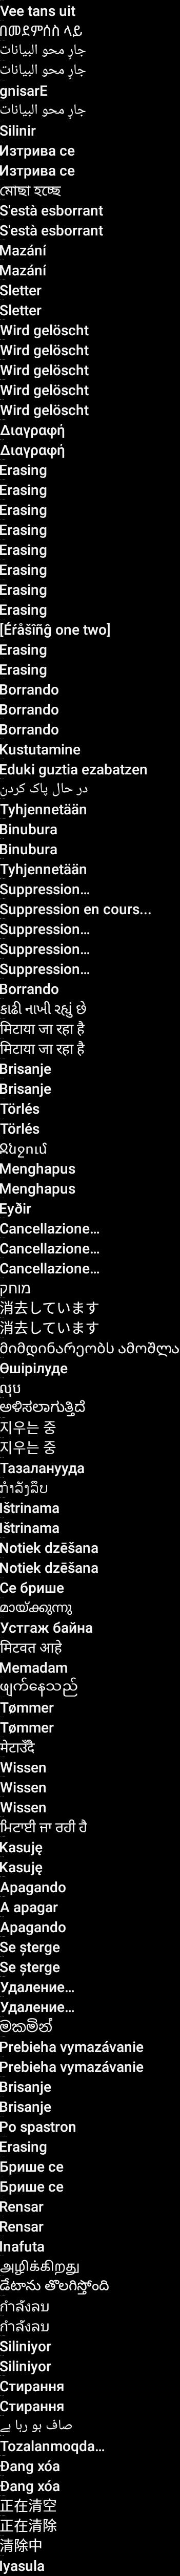 res-xhdpi/images/erasing_text.png